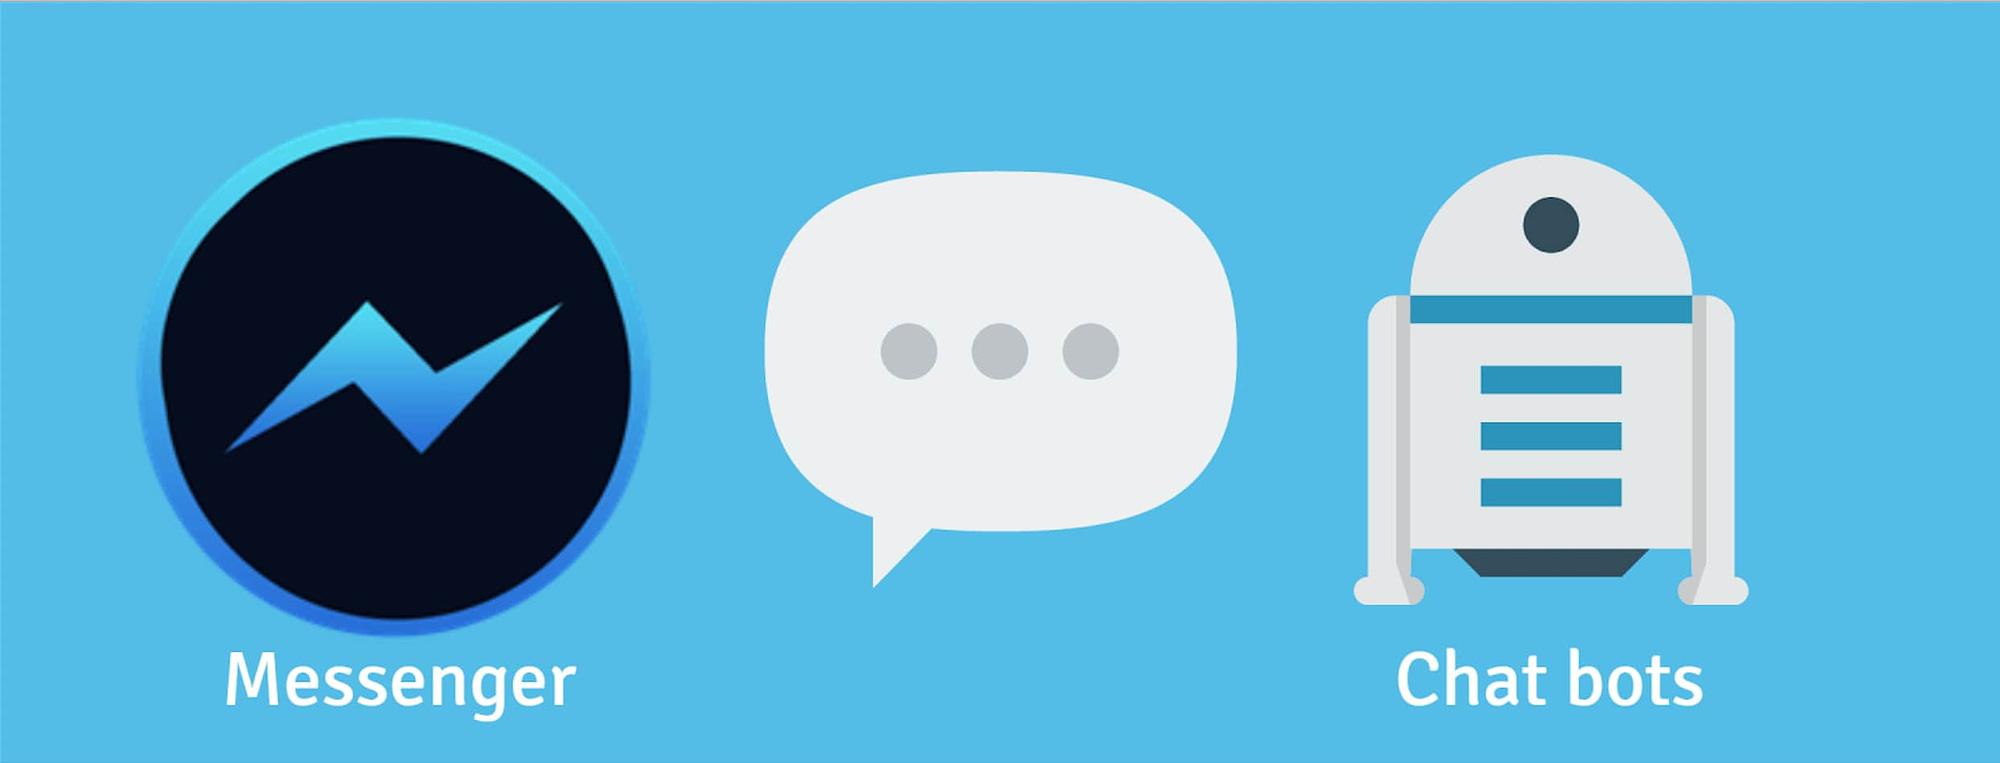 messenger-bot